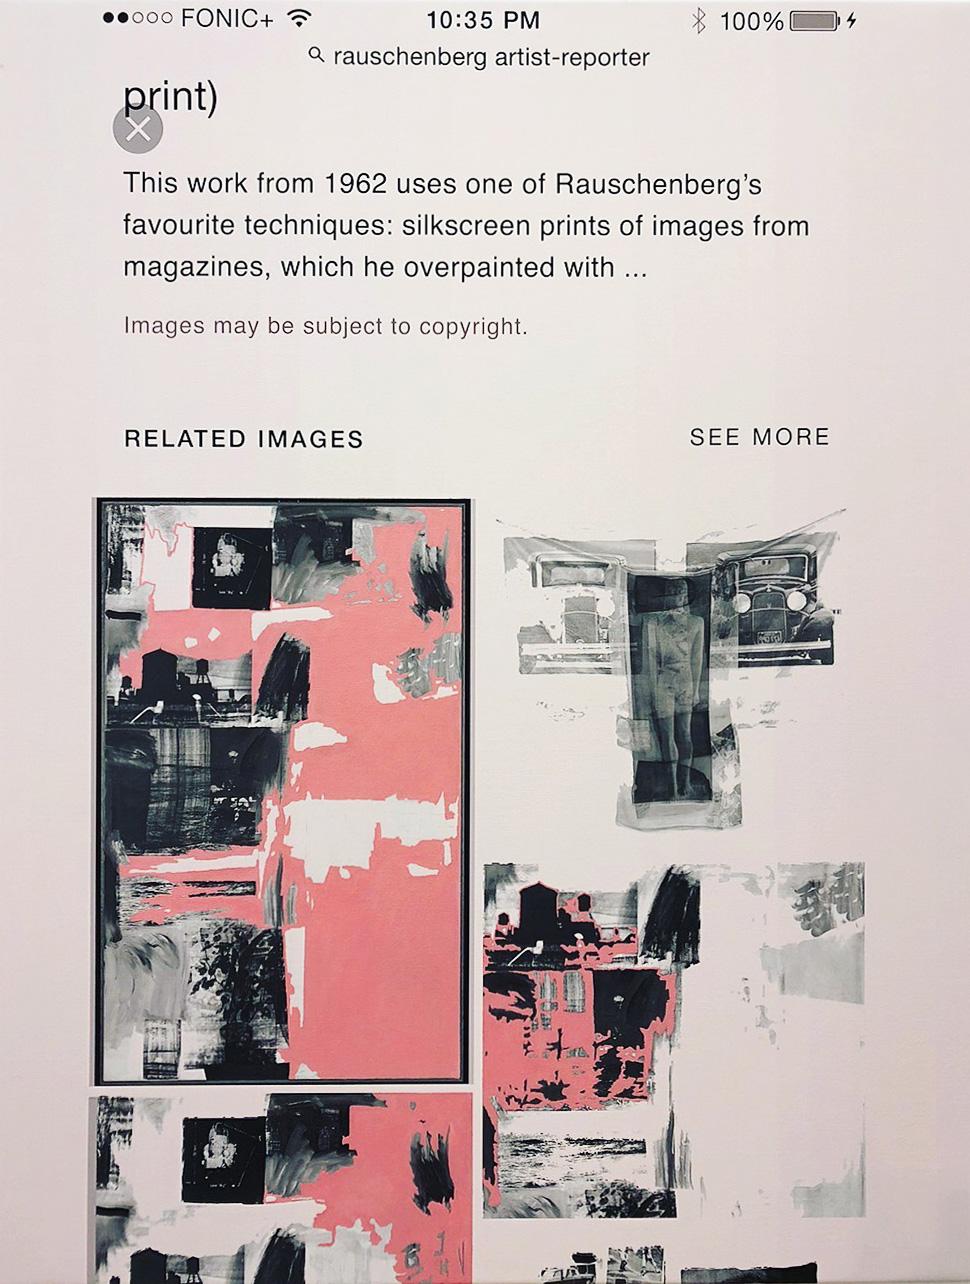 """q=artist+reporter"", 100 cm x 130 cm, inkjet and acrylic on canvas."